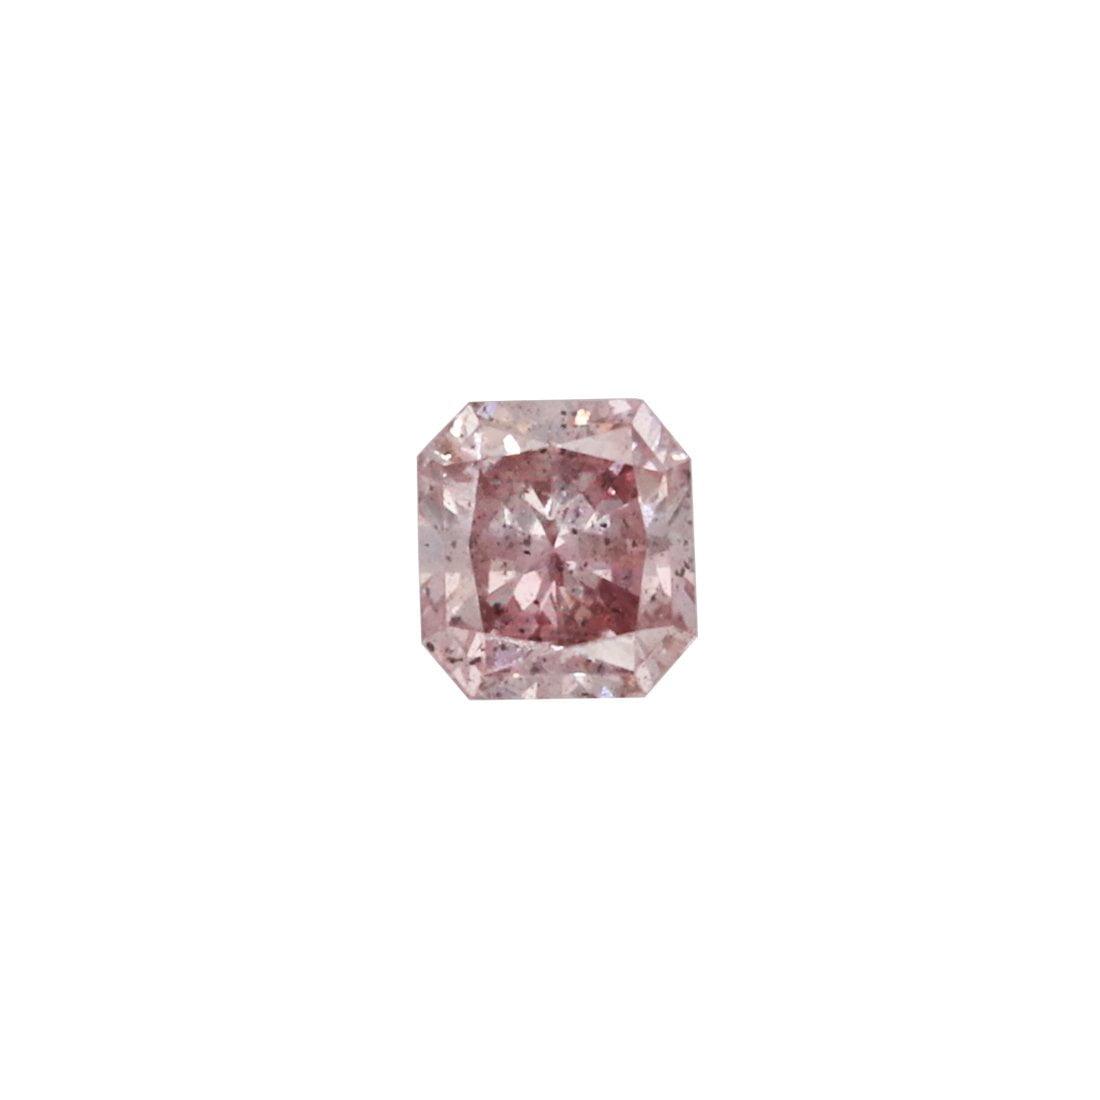 0.17ct Natural Fancy Light Pink, 8PR Argyle Diamond